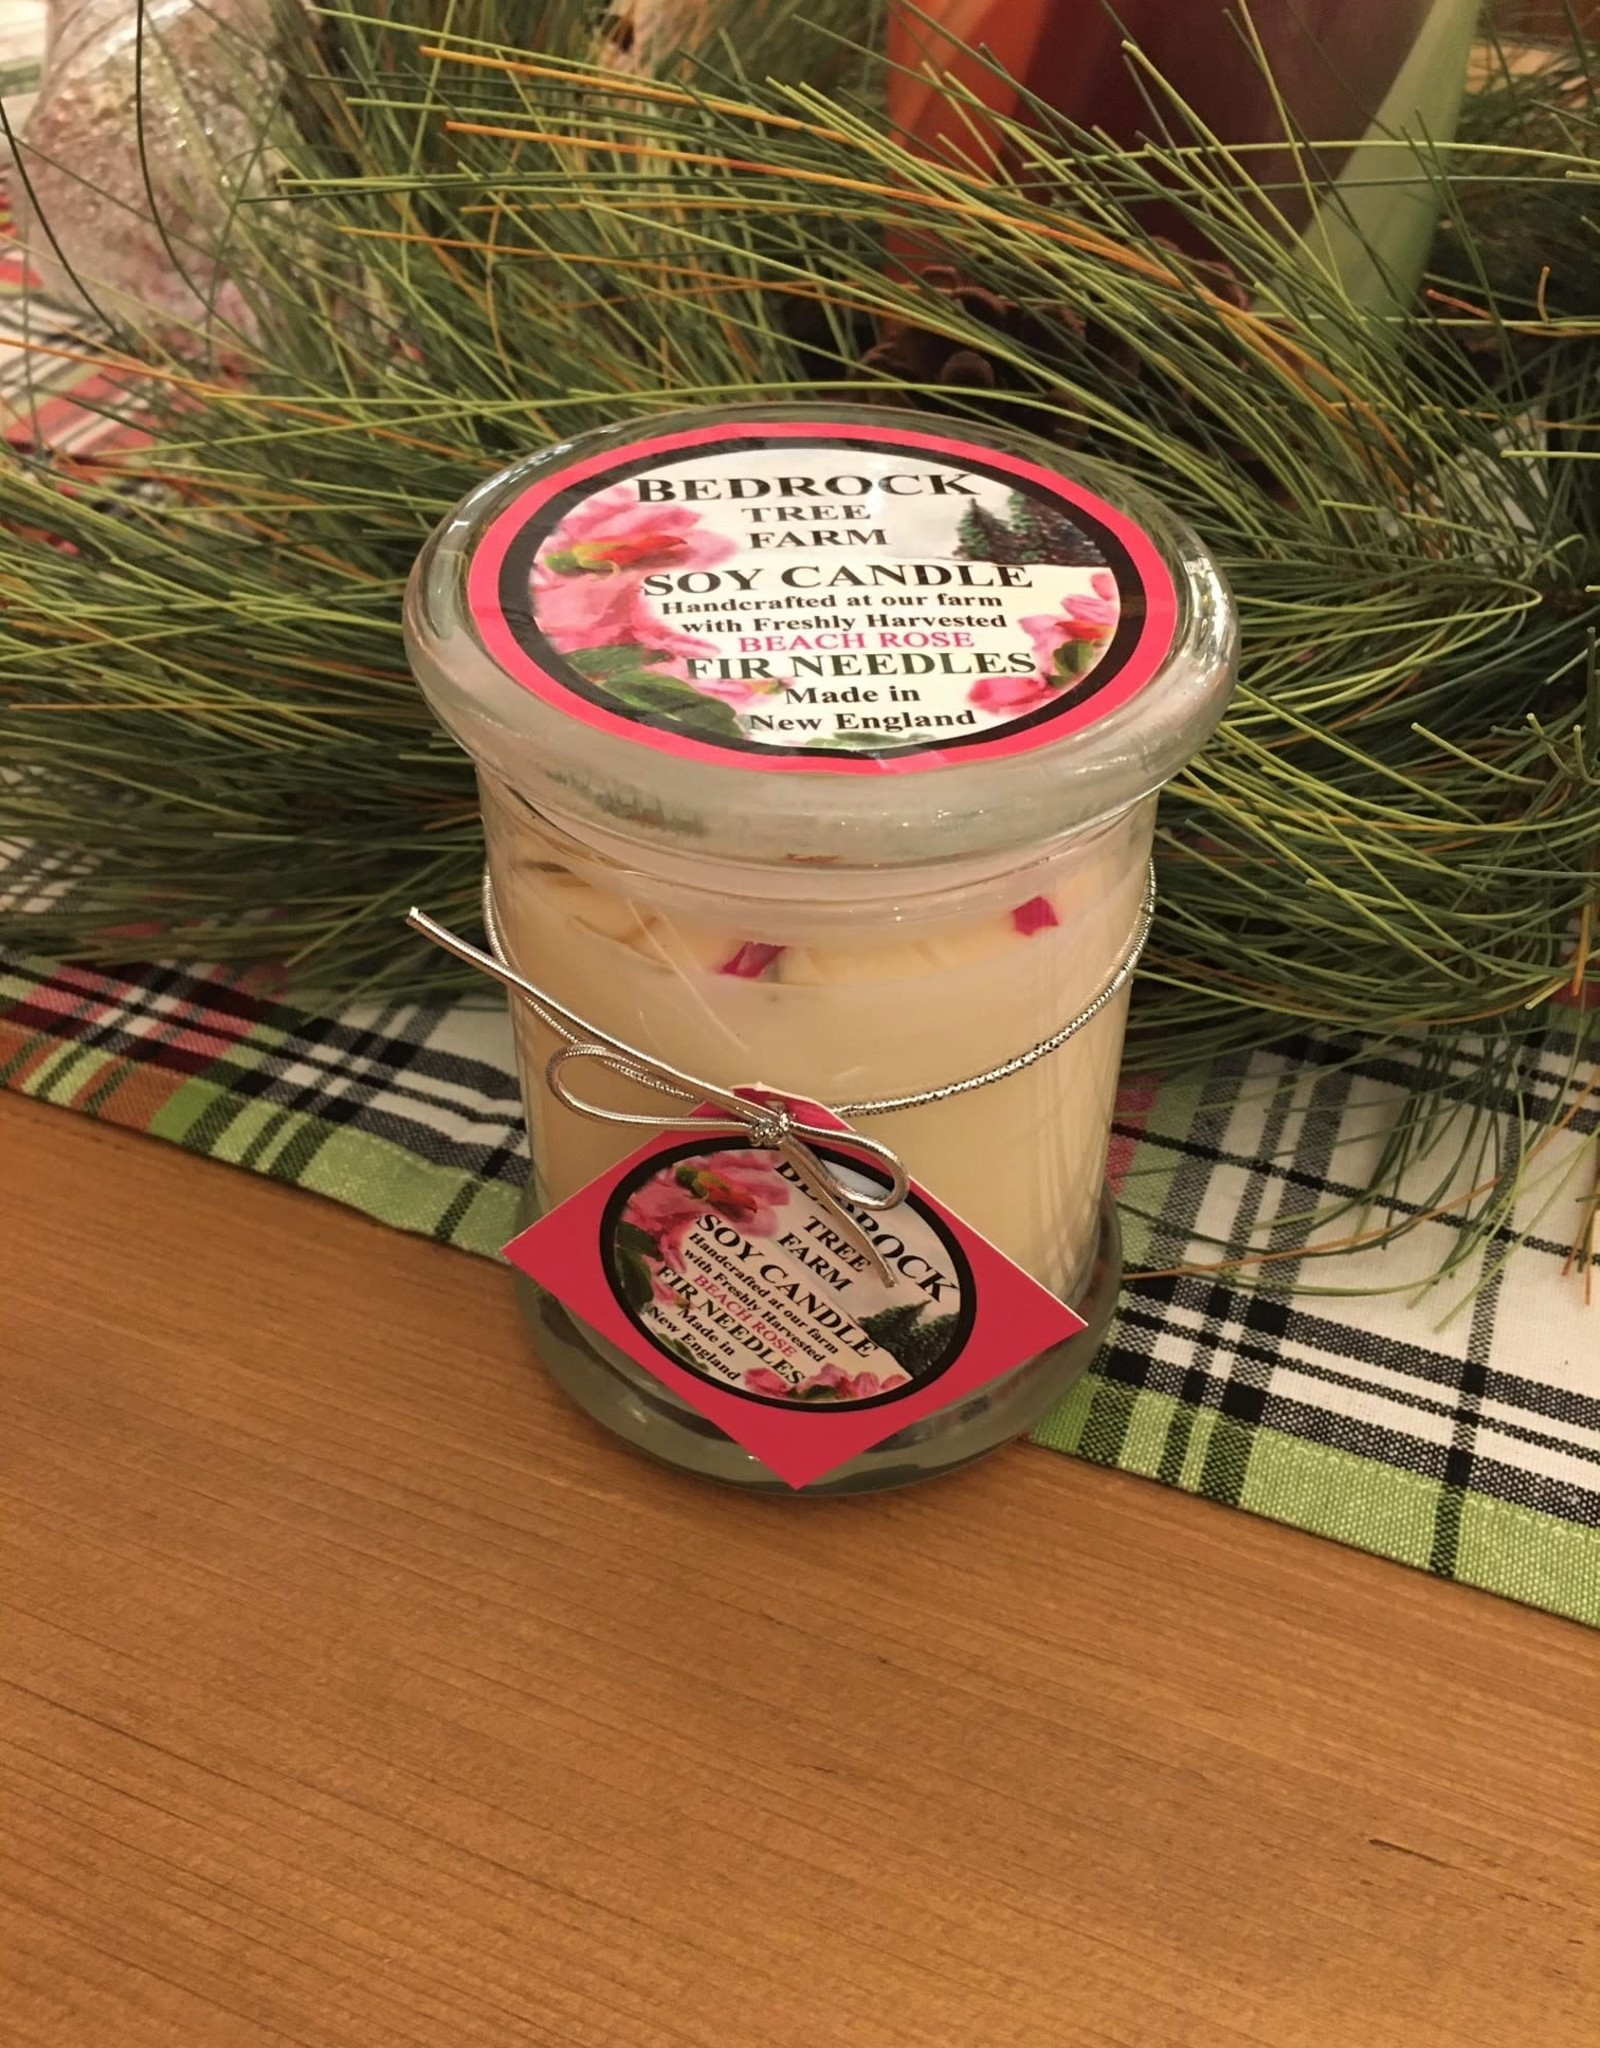 Fir Needle/Beach Rose Soy Candle - 12 oz